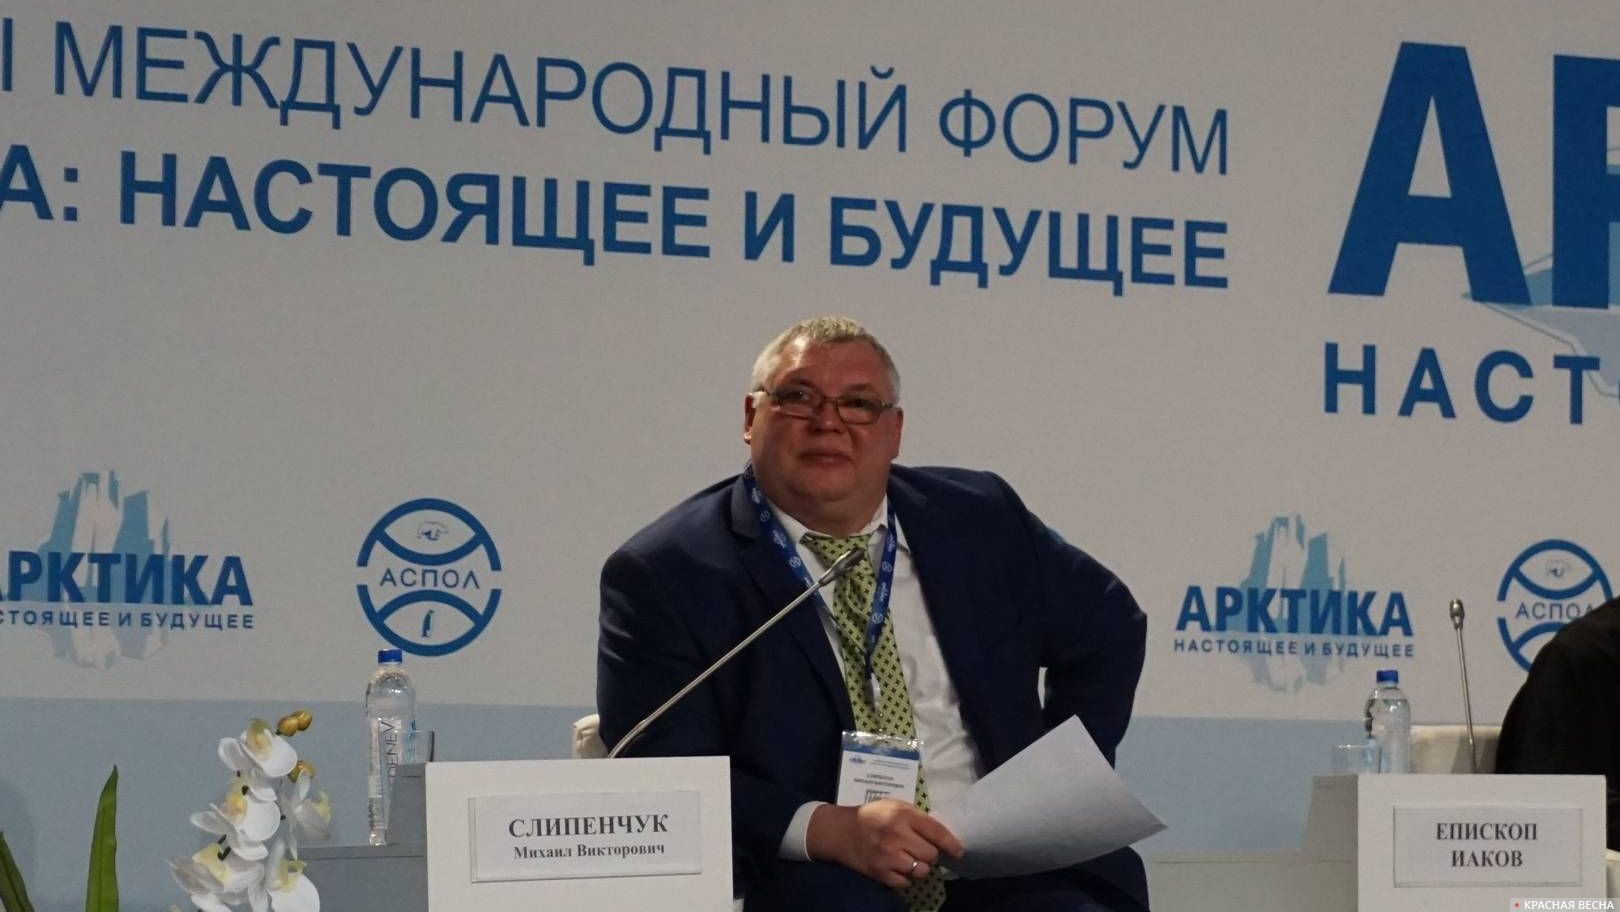 Михаил Слипенчук. Санкт-Петербург. 05.12.2018